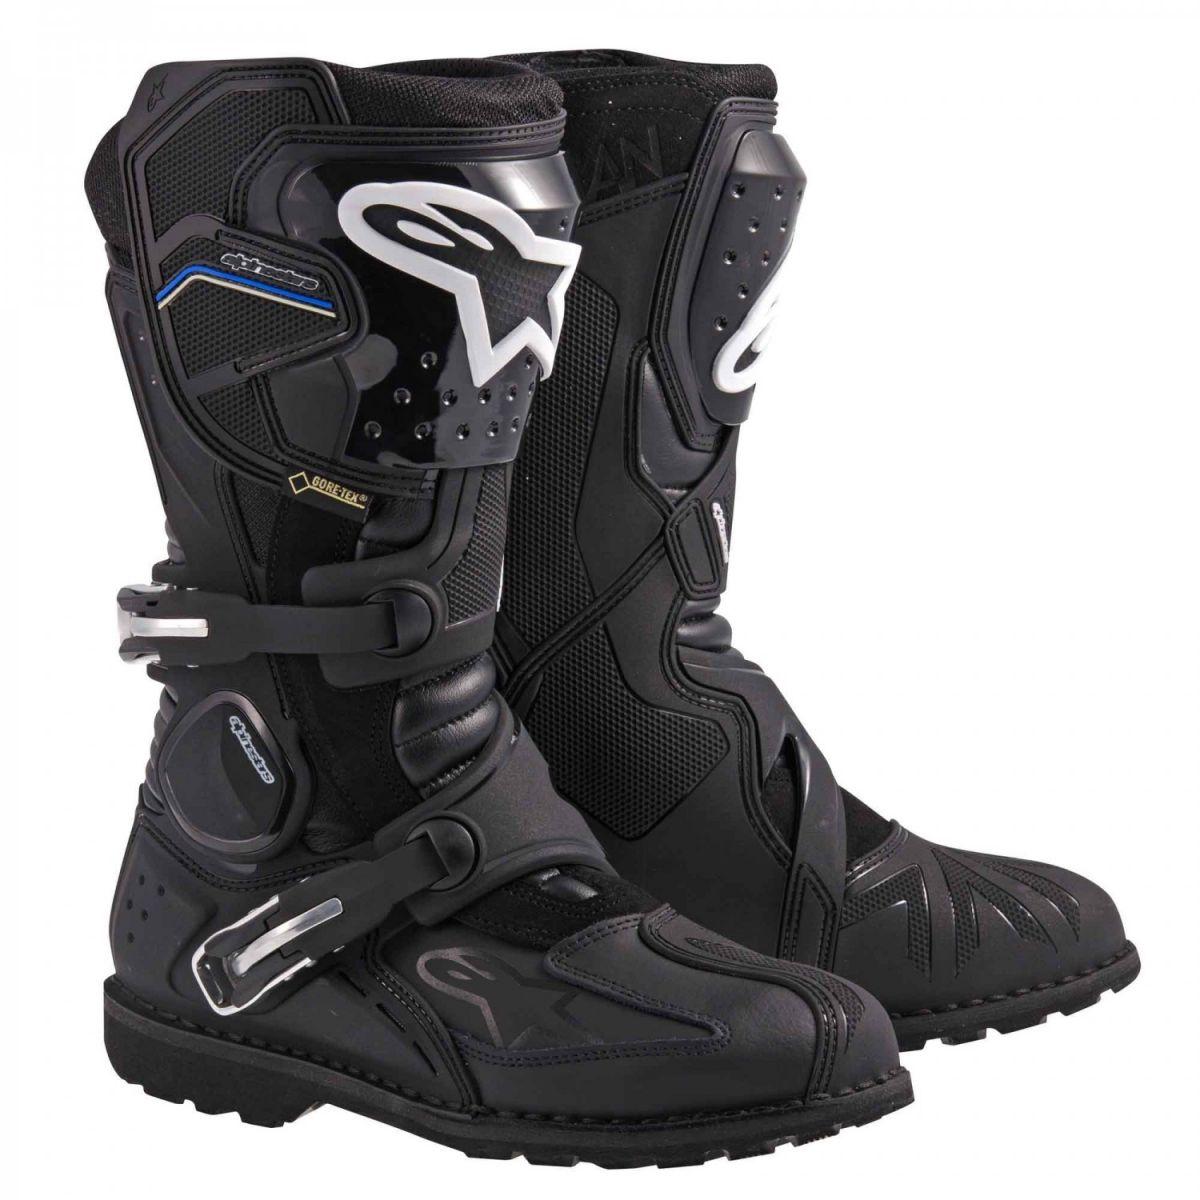 Bota Alpinestars Toucan Gore-tex Preta Big Trail  - Nova Suzuki Motos e Acessórios